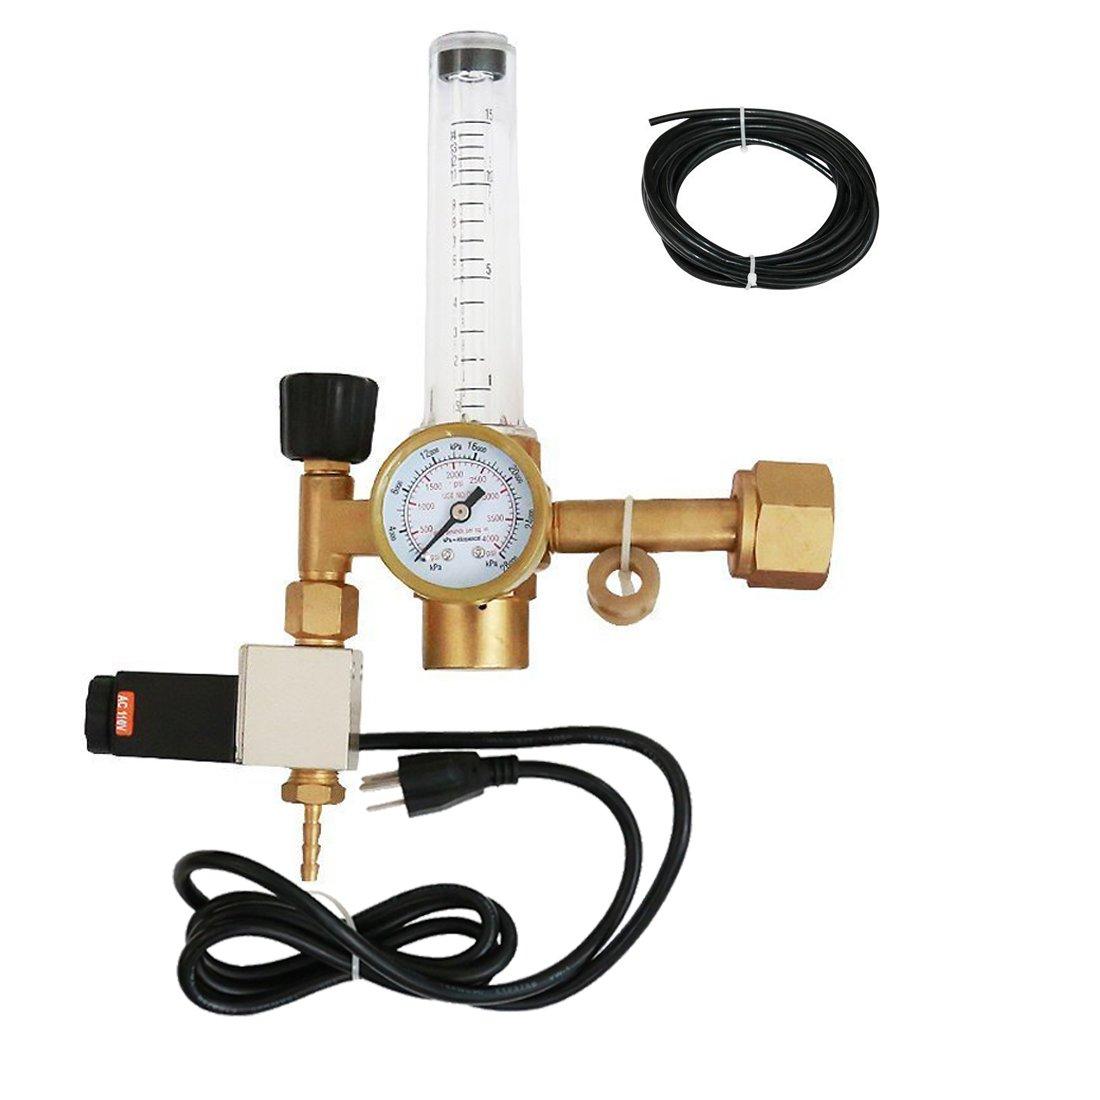 VIVOSUN Hydroponics Regulator Solenoid Flowmeter